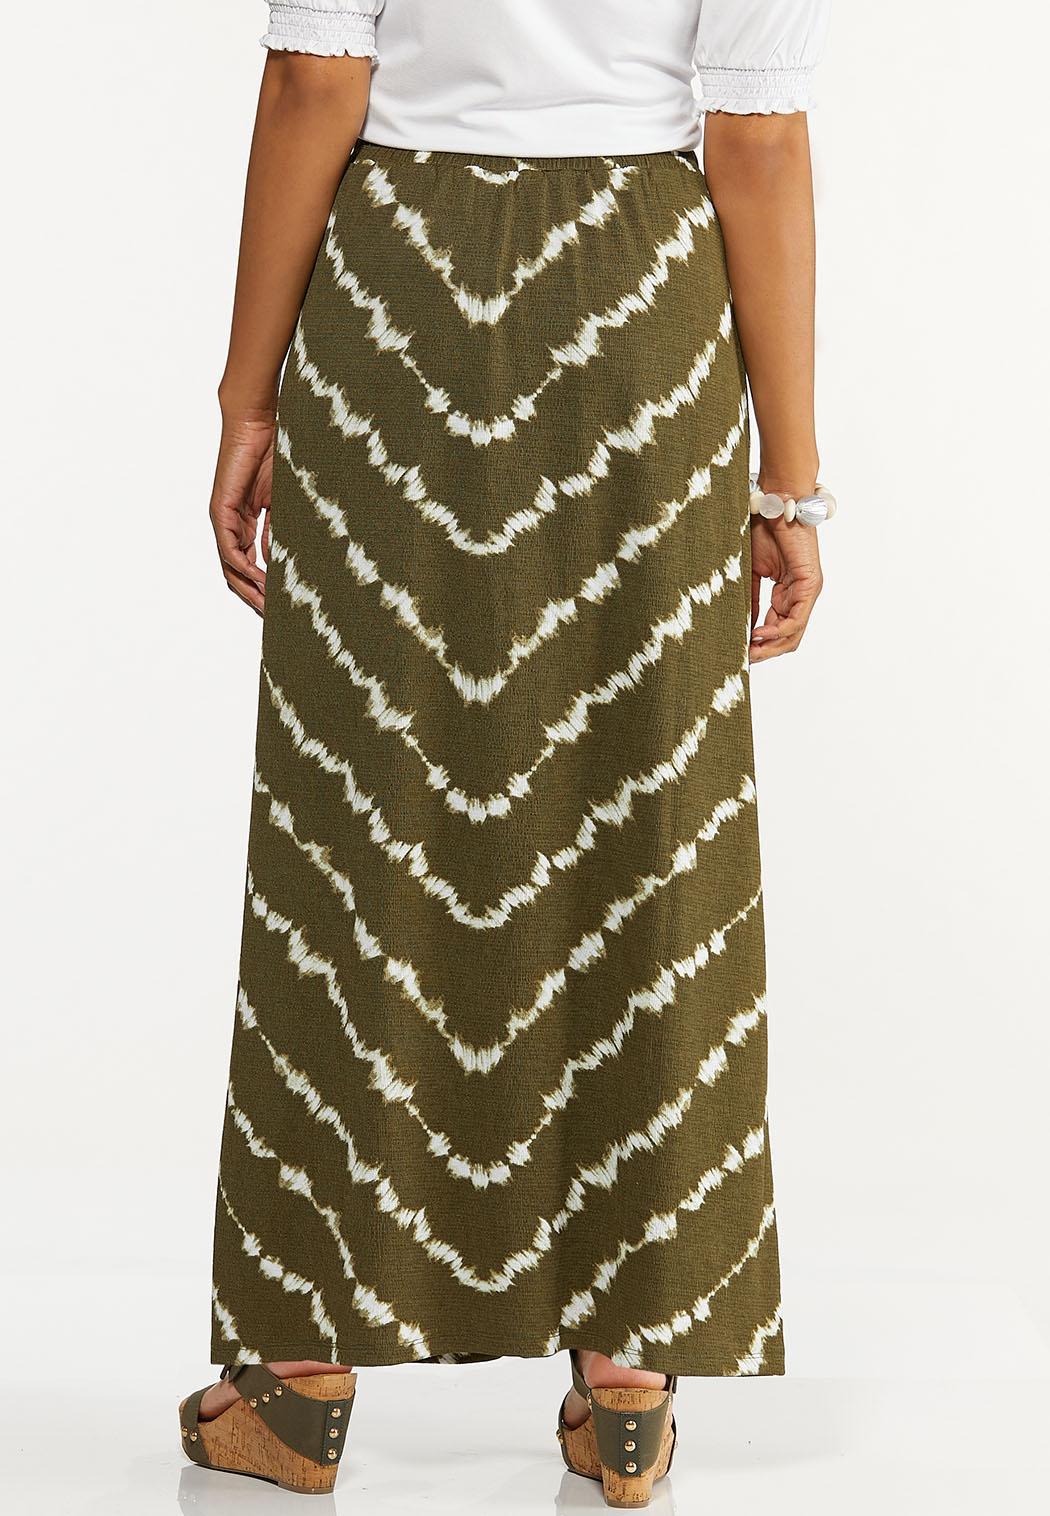 Plus Size Olive Tie Dye Maxi Skirt (Item #44614867)